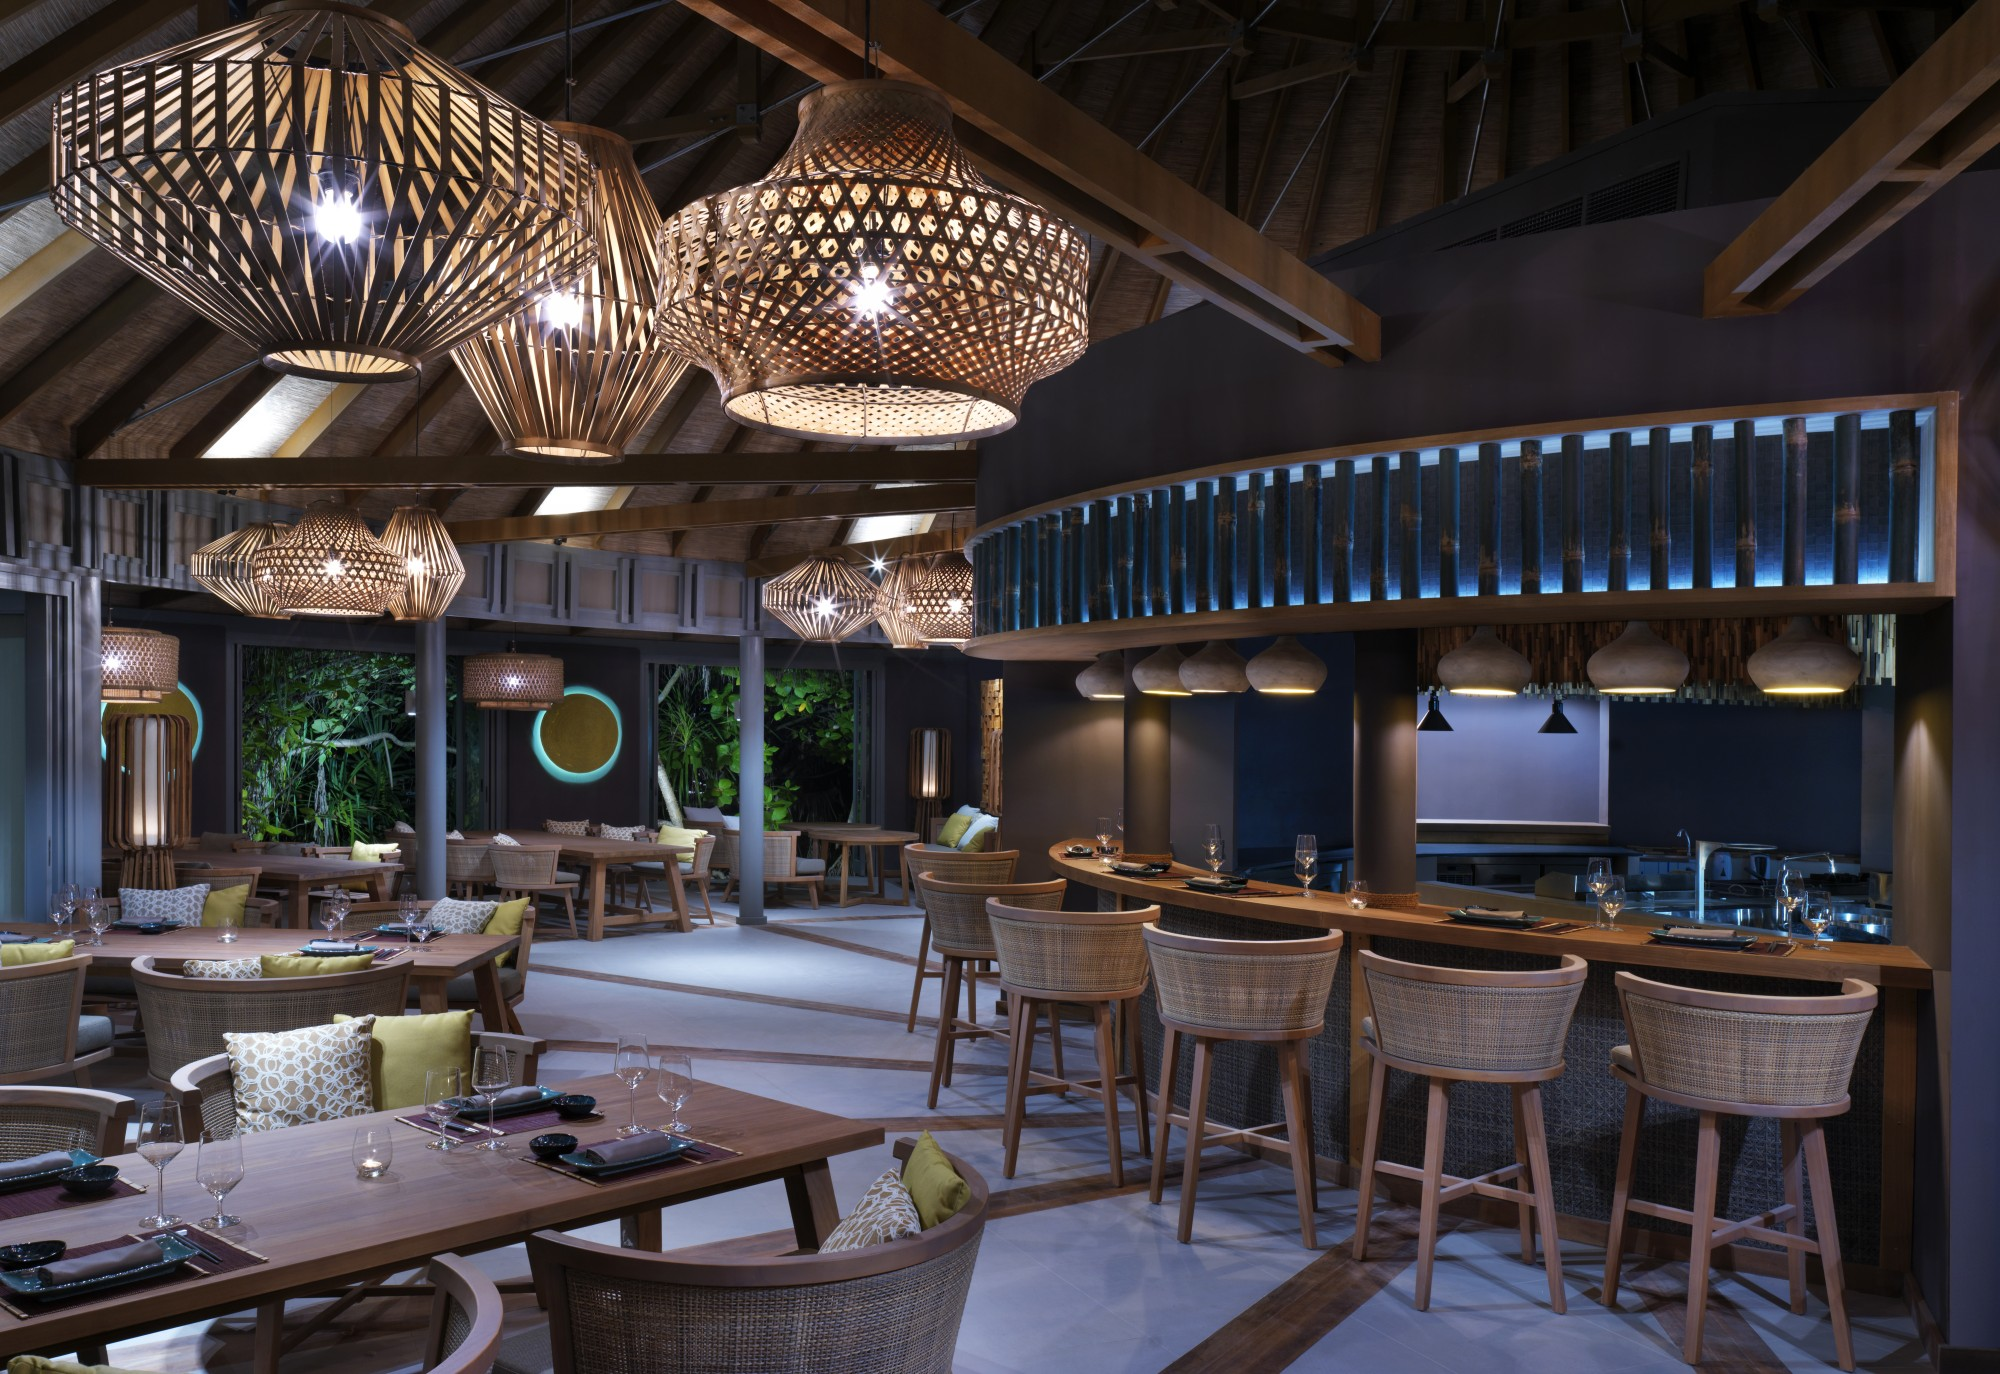 https://www.otdesign.com/wp-content/uploads/2020/11/OTdesign_Vakkaru_onu-restaurant.jpg